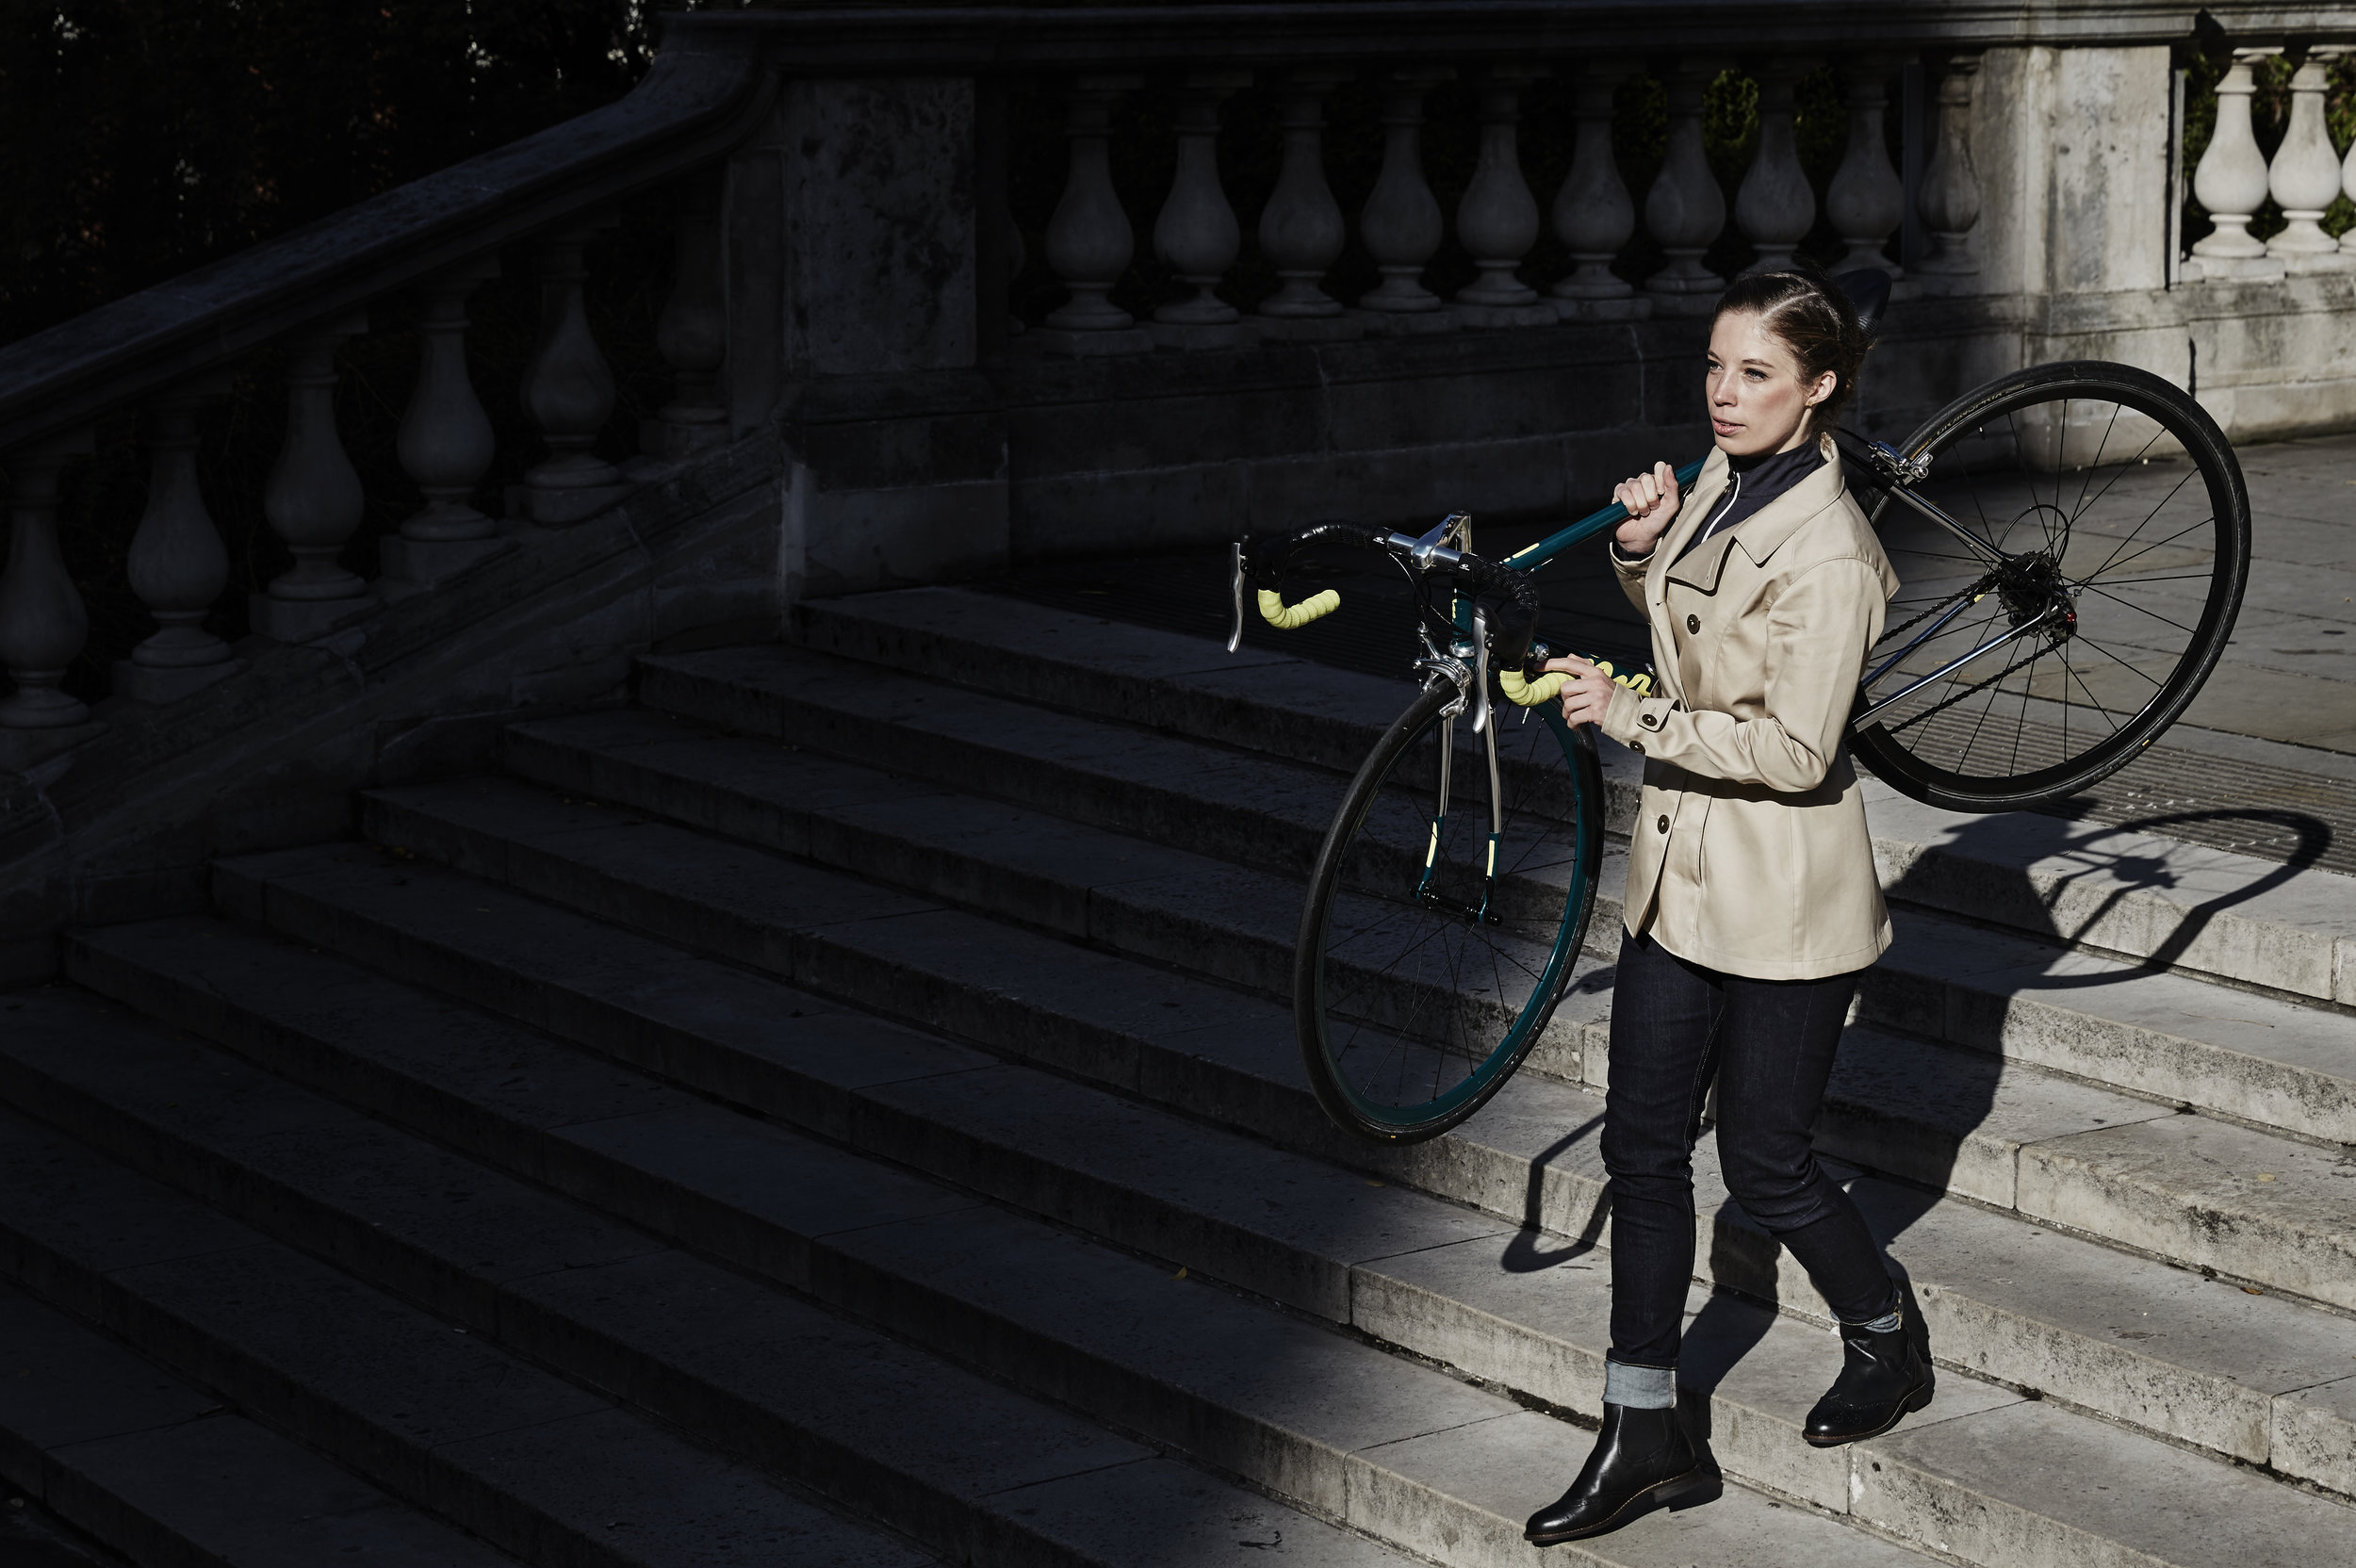 vulpine nick hussey women woman cycling style apparel urban city.jpg